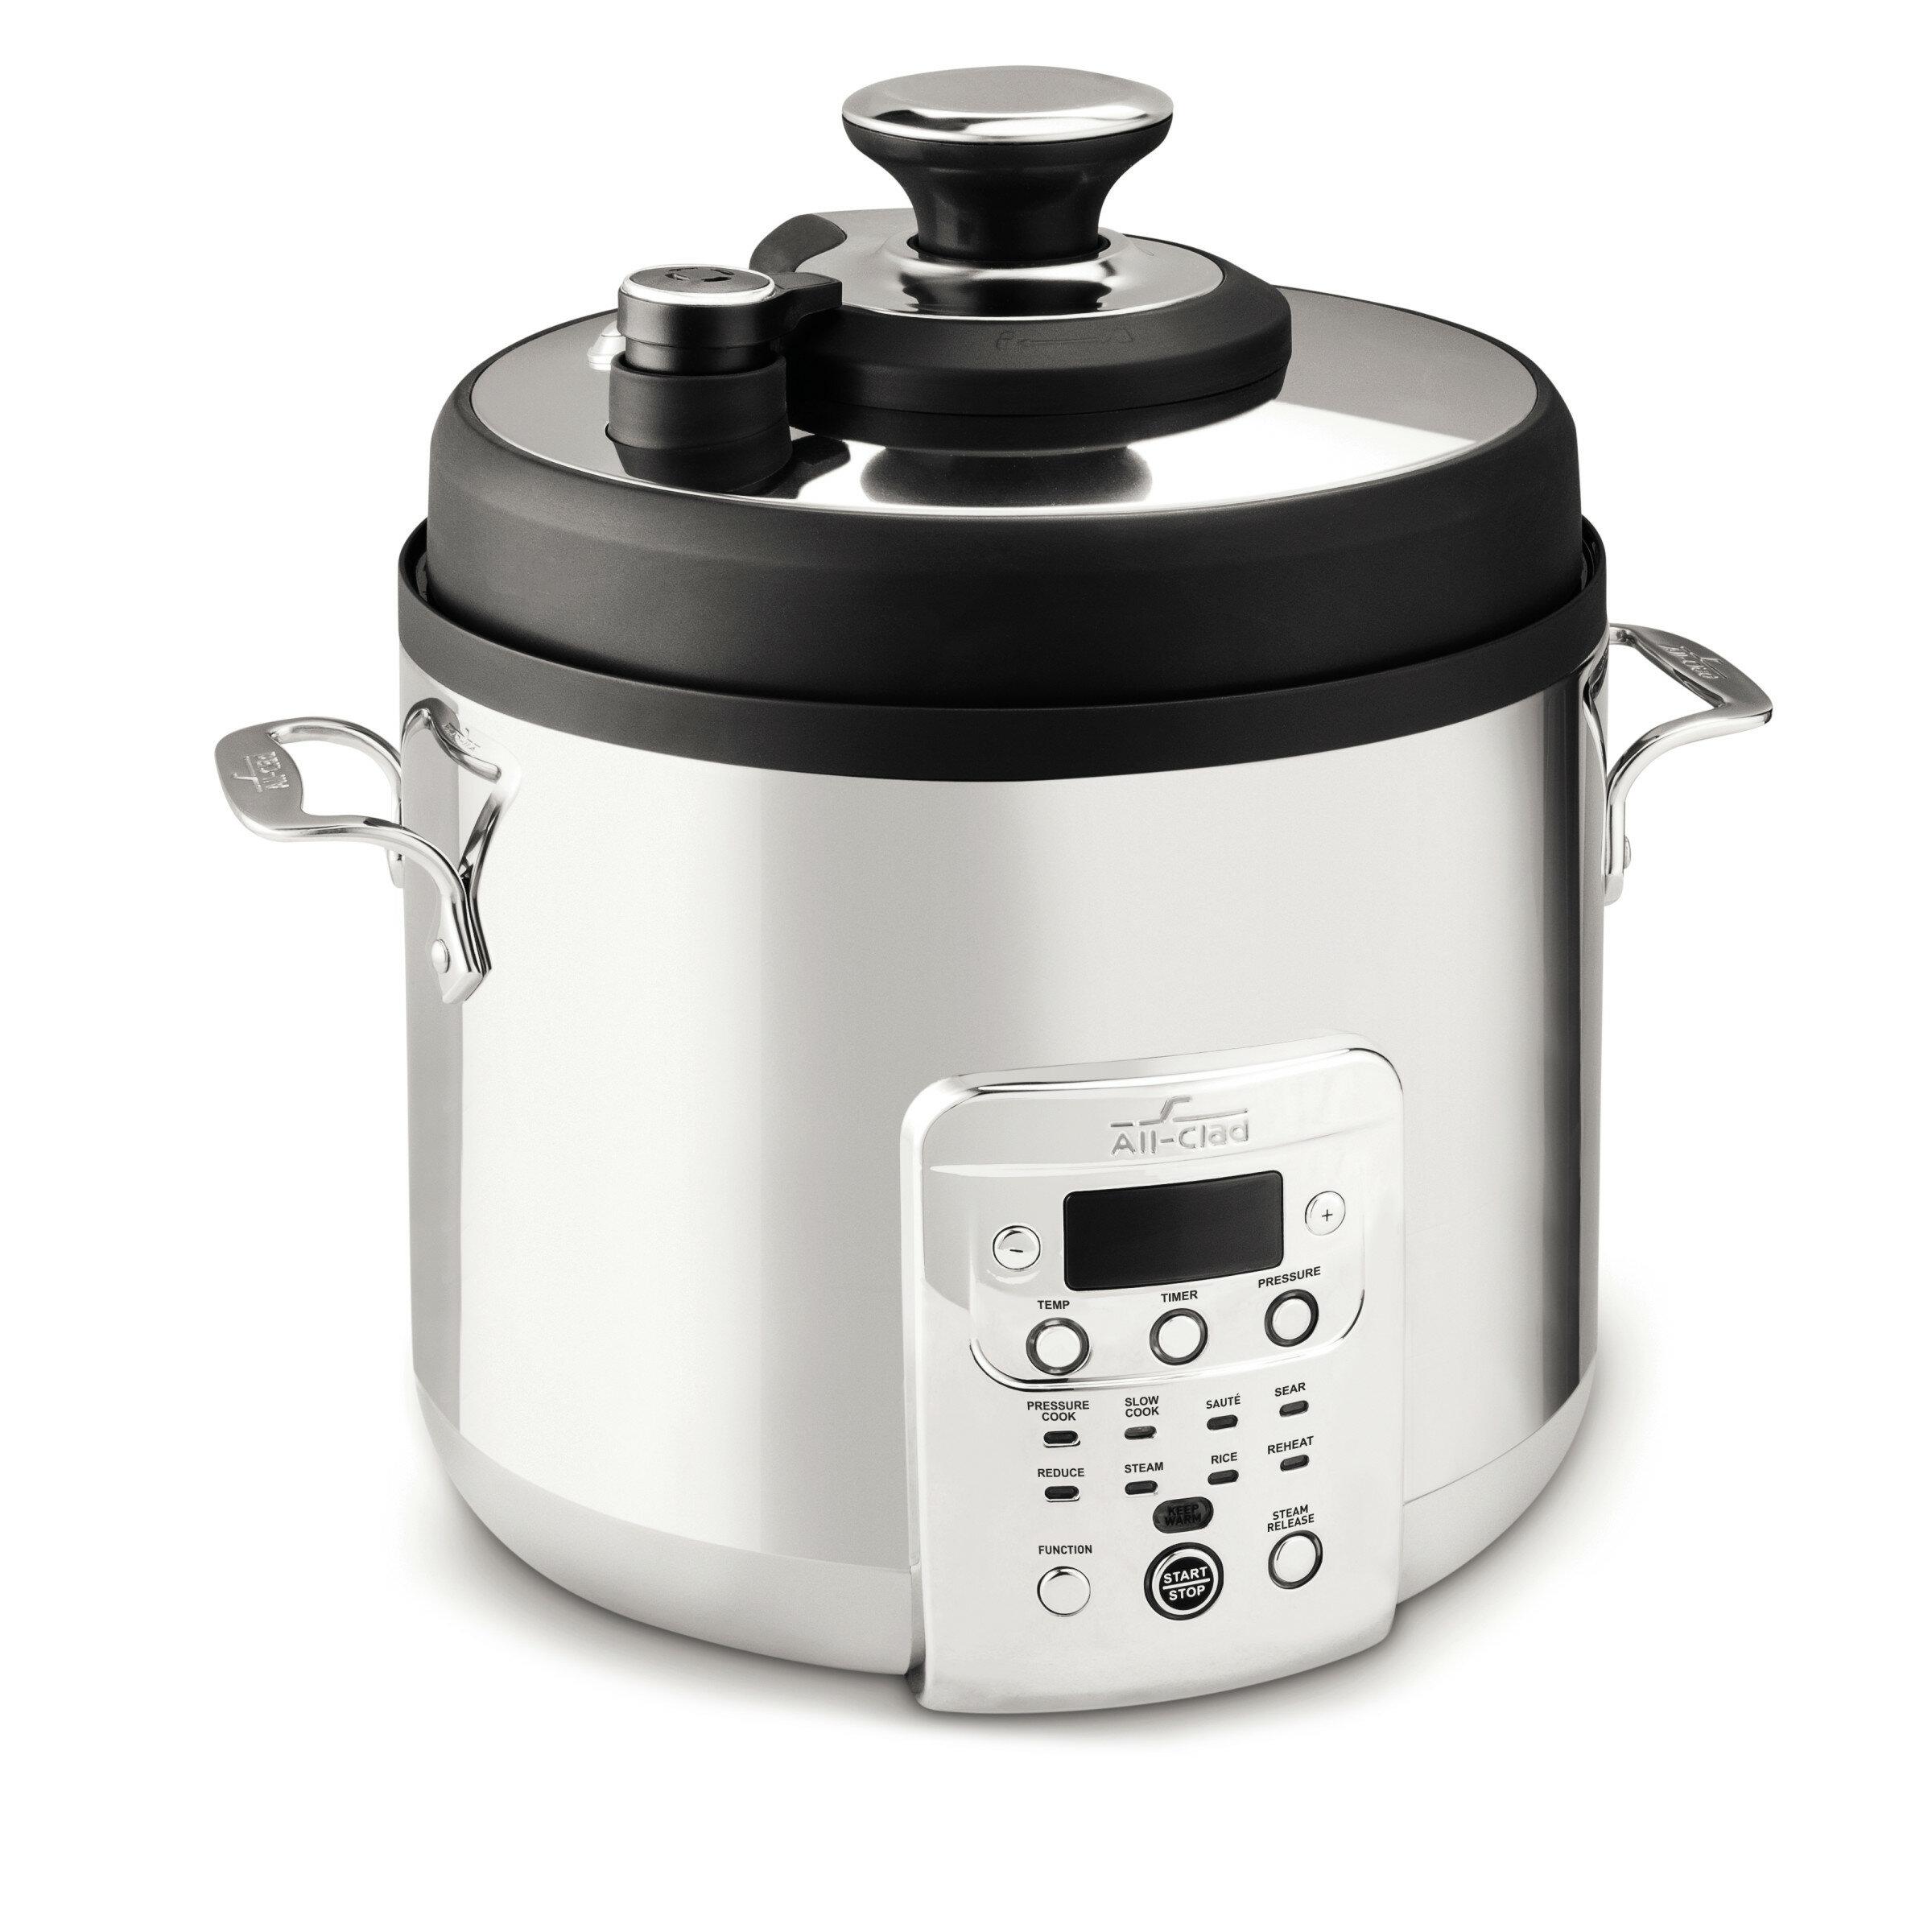 All-Clad Electric Pressure Cooker | Wayfair